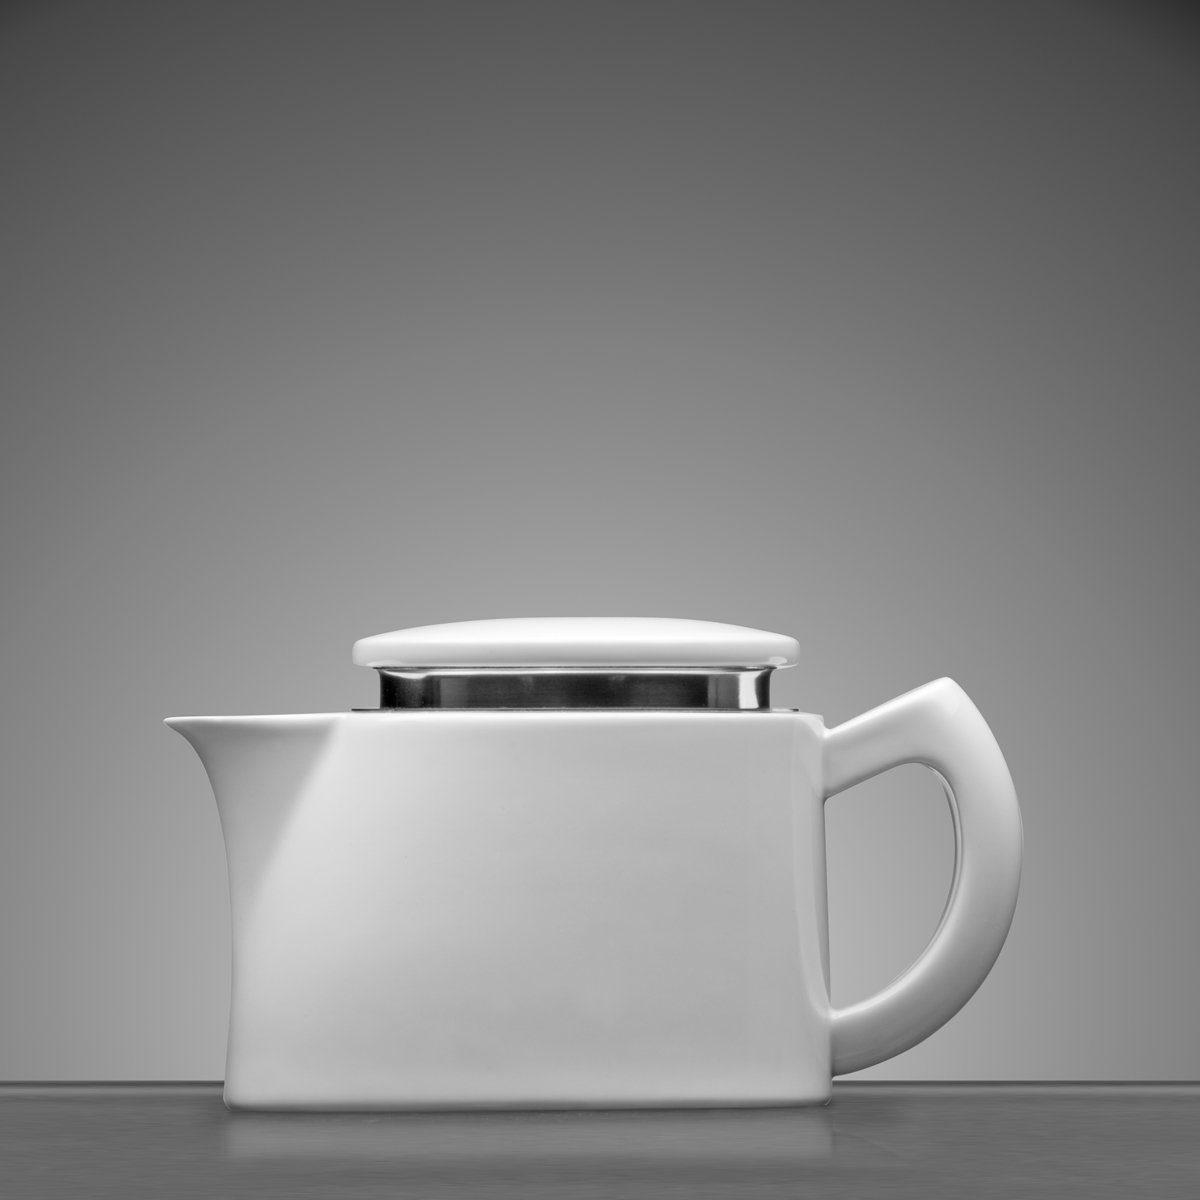 Sowden Sowden SoftBrew Kaffeekanne OSKAR 0.4 l